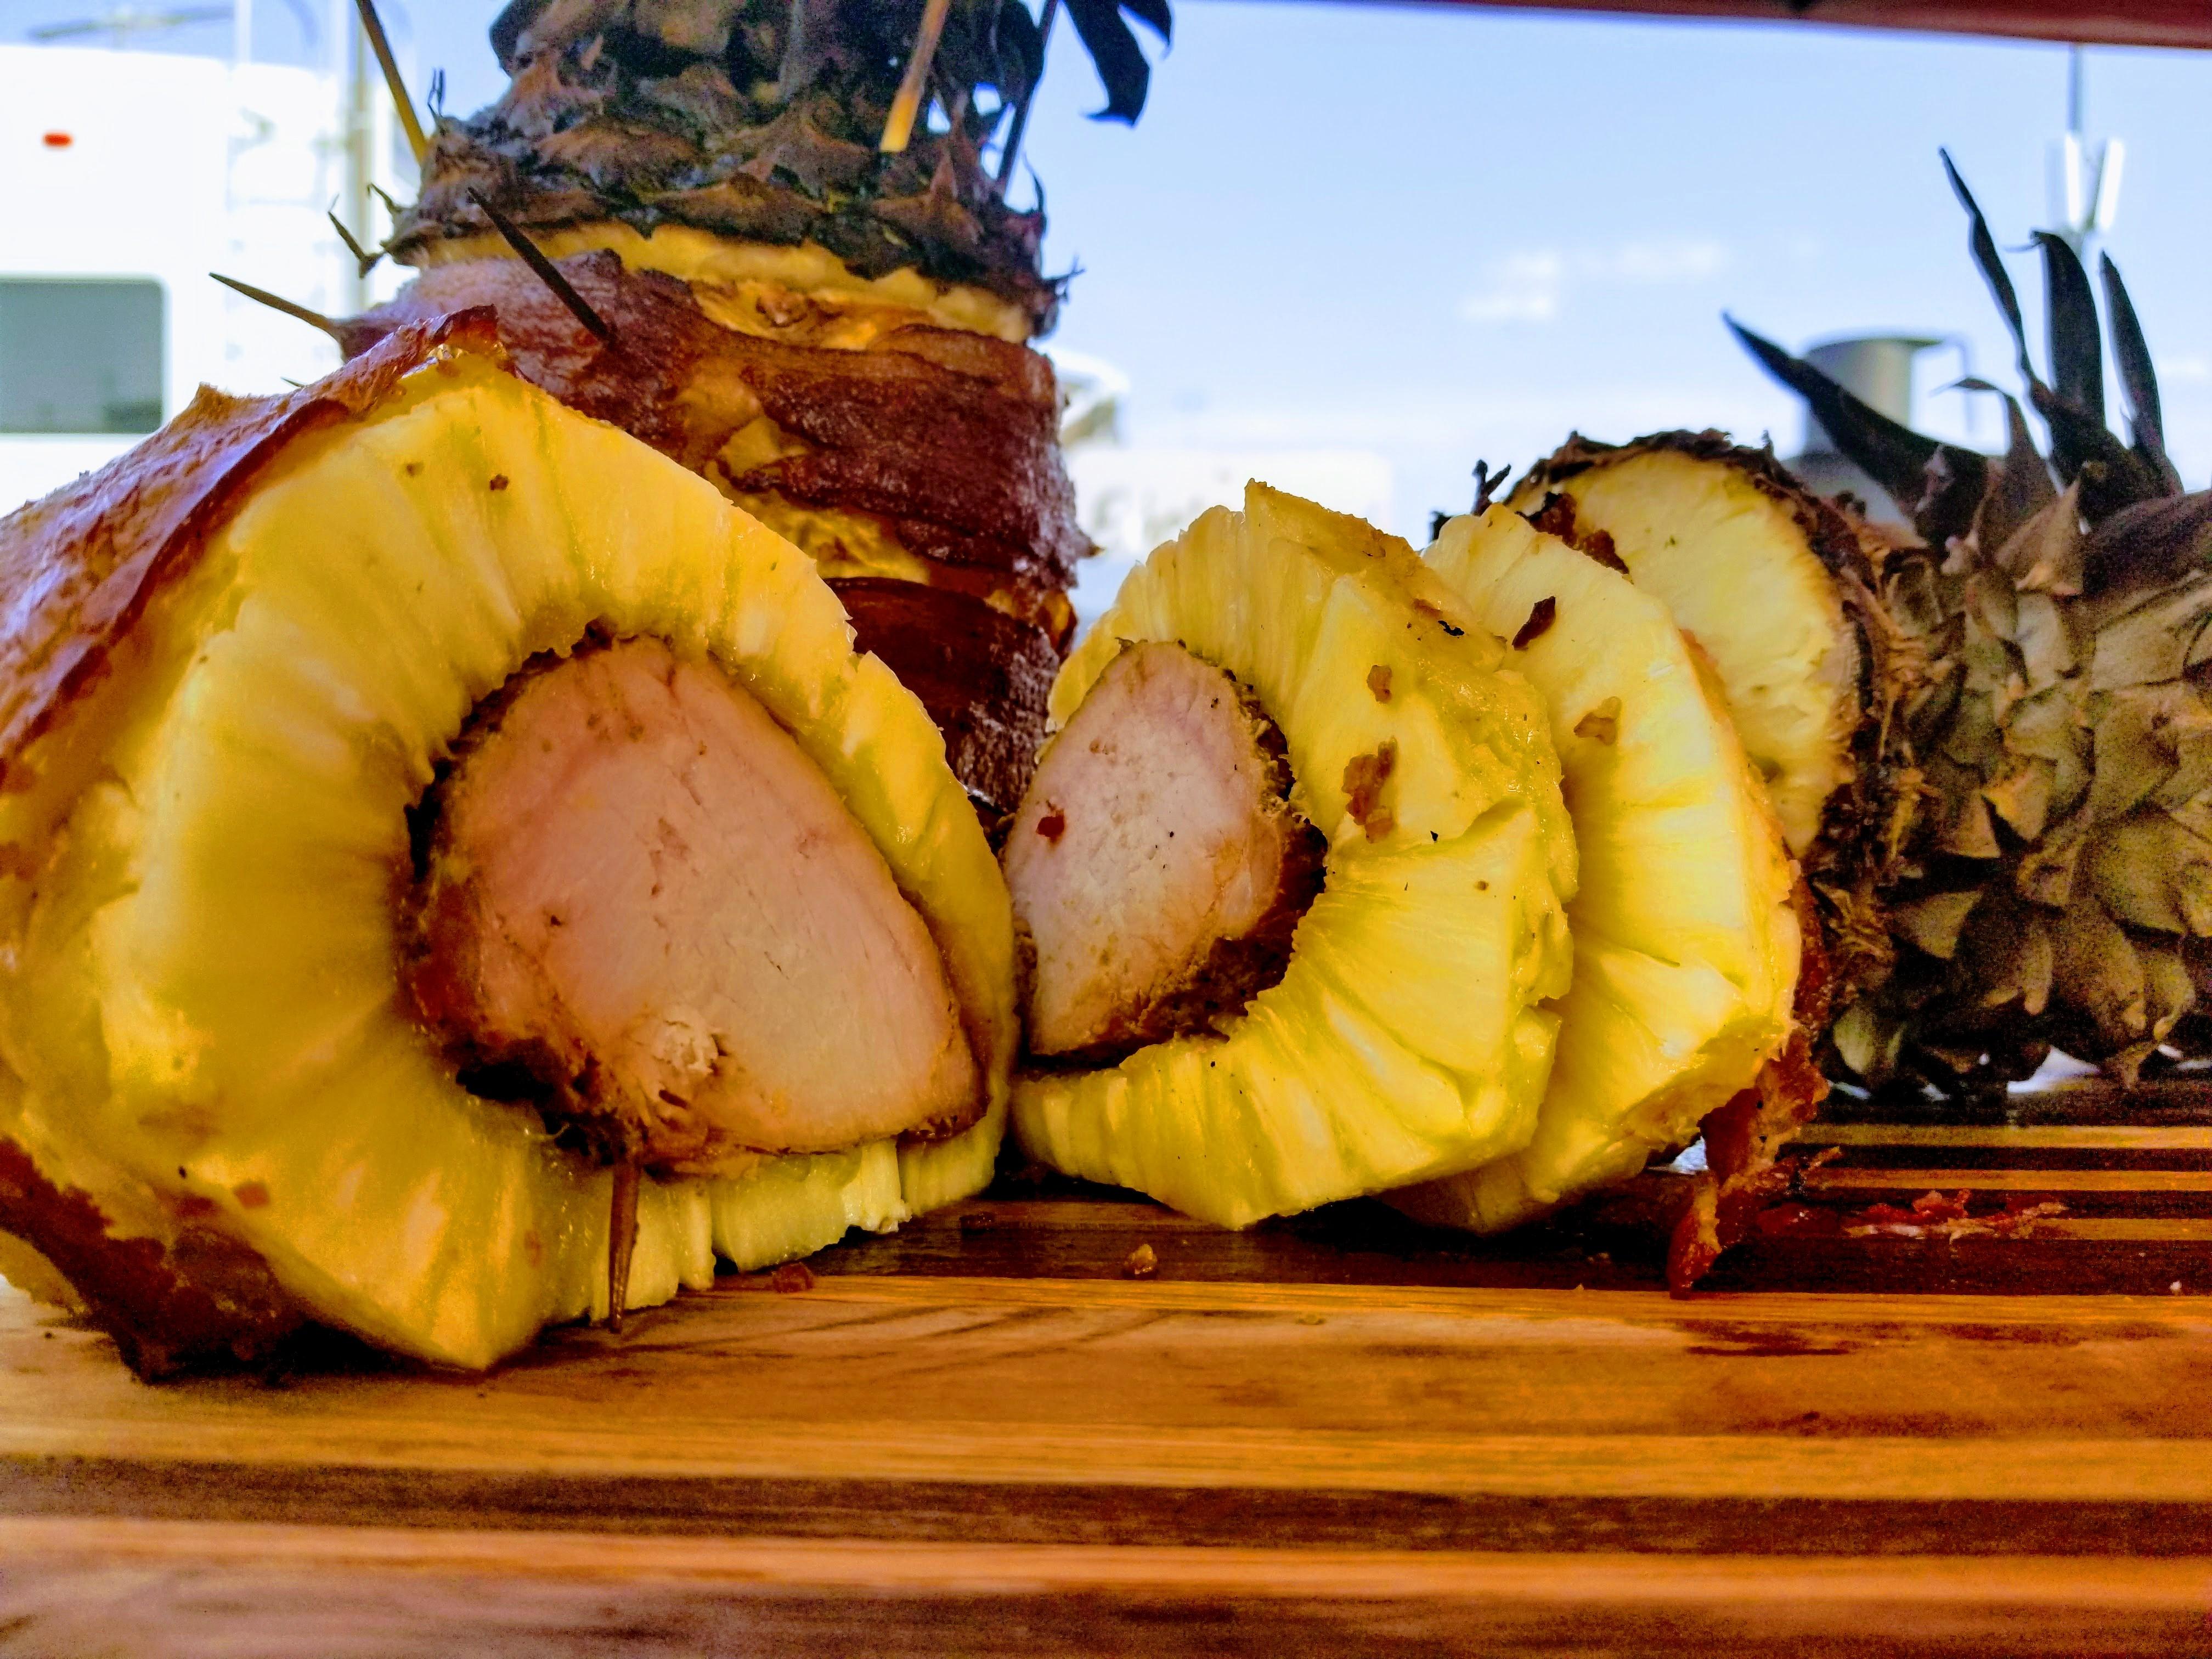 Smoked Swineapple – Pineapple stuffed with Pork Loin